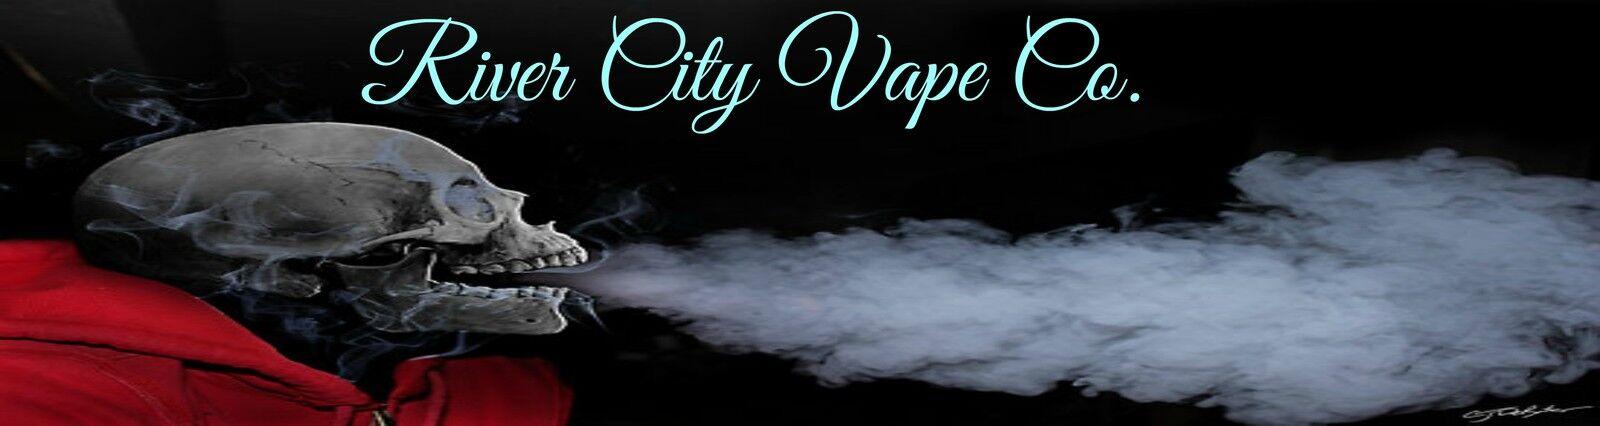 River City Vape Company